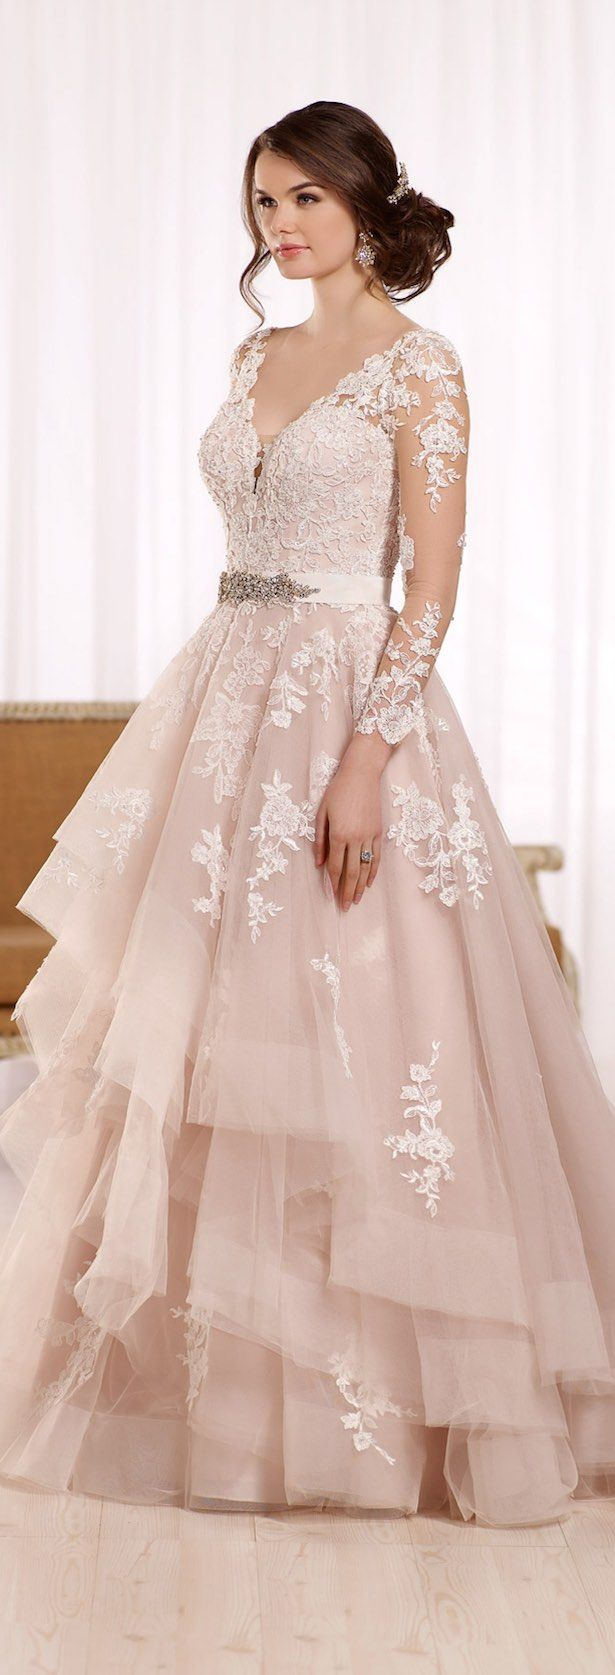 57 best Wedding ideas images on Pinterest | Wedding frocks, Bridal ...